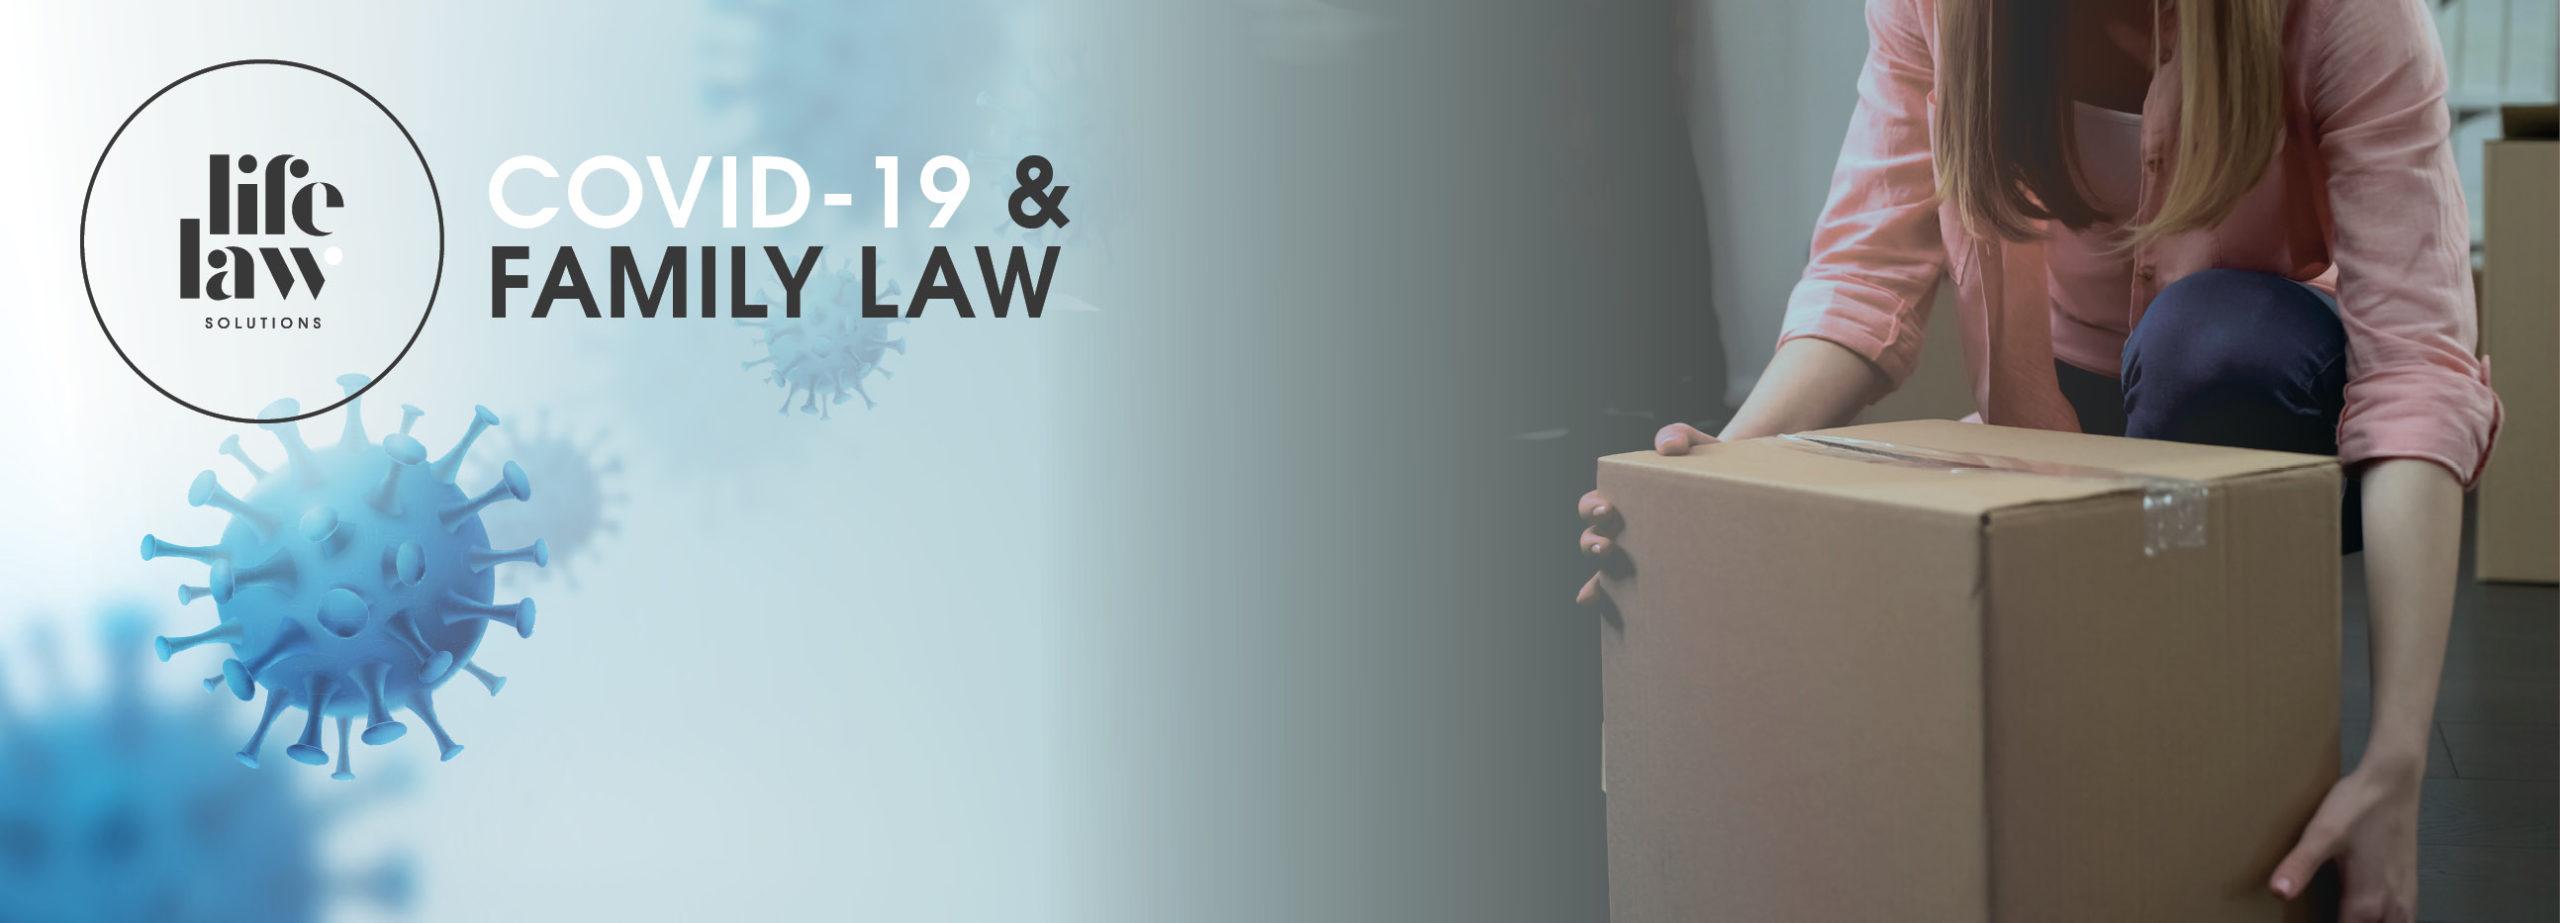 Covid-19 Family Law